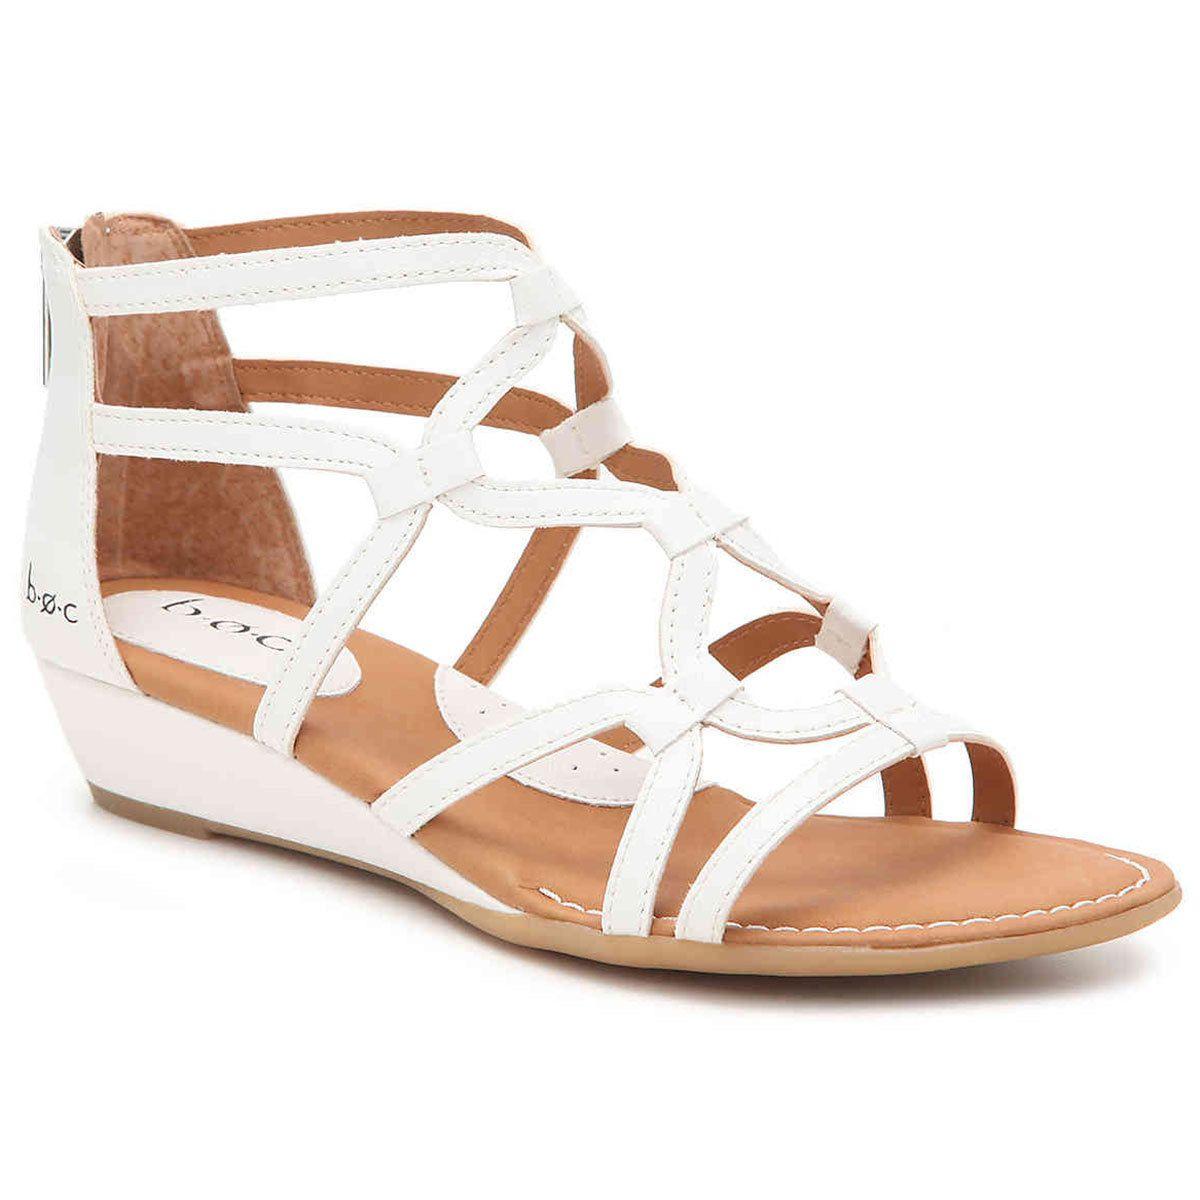 a11edec4a90a Shop now for B.O.C. Women s Pawel Demi Wedge Sandals